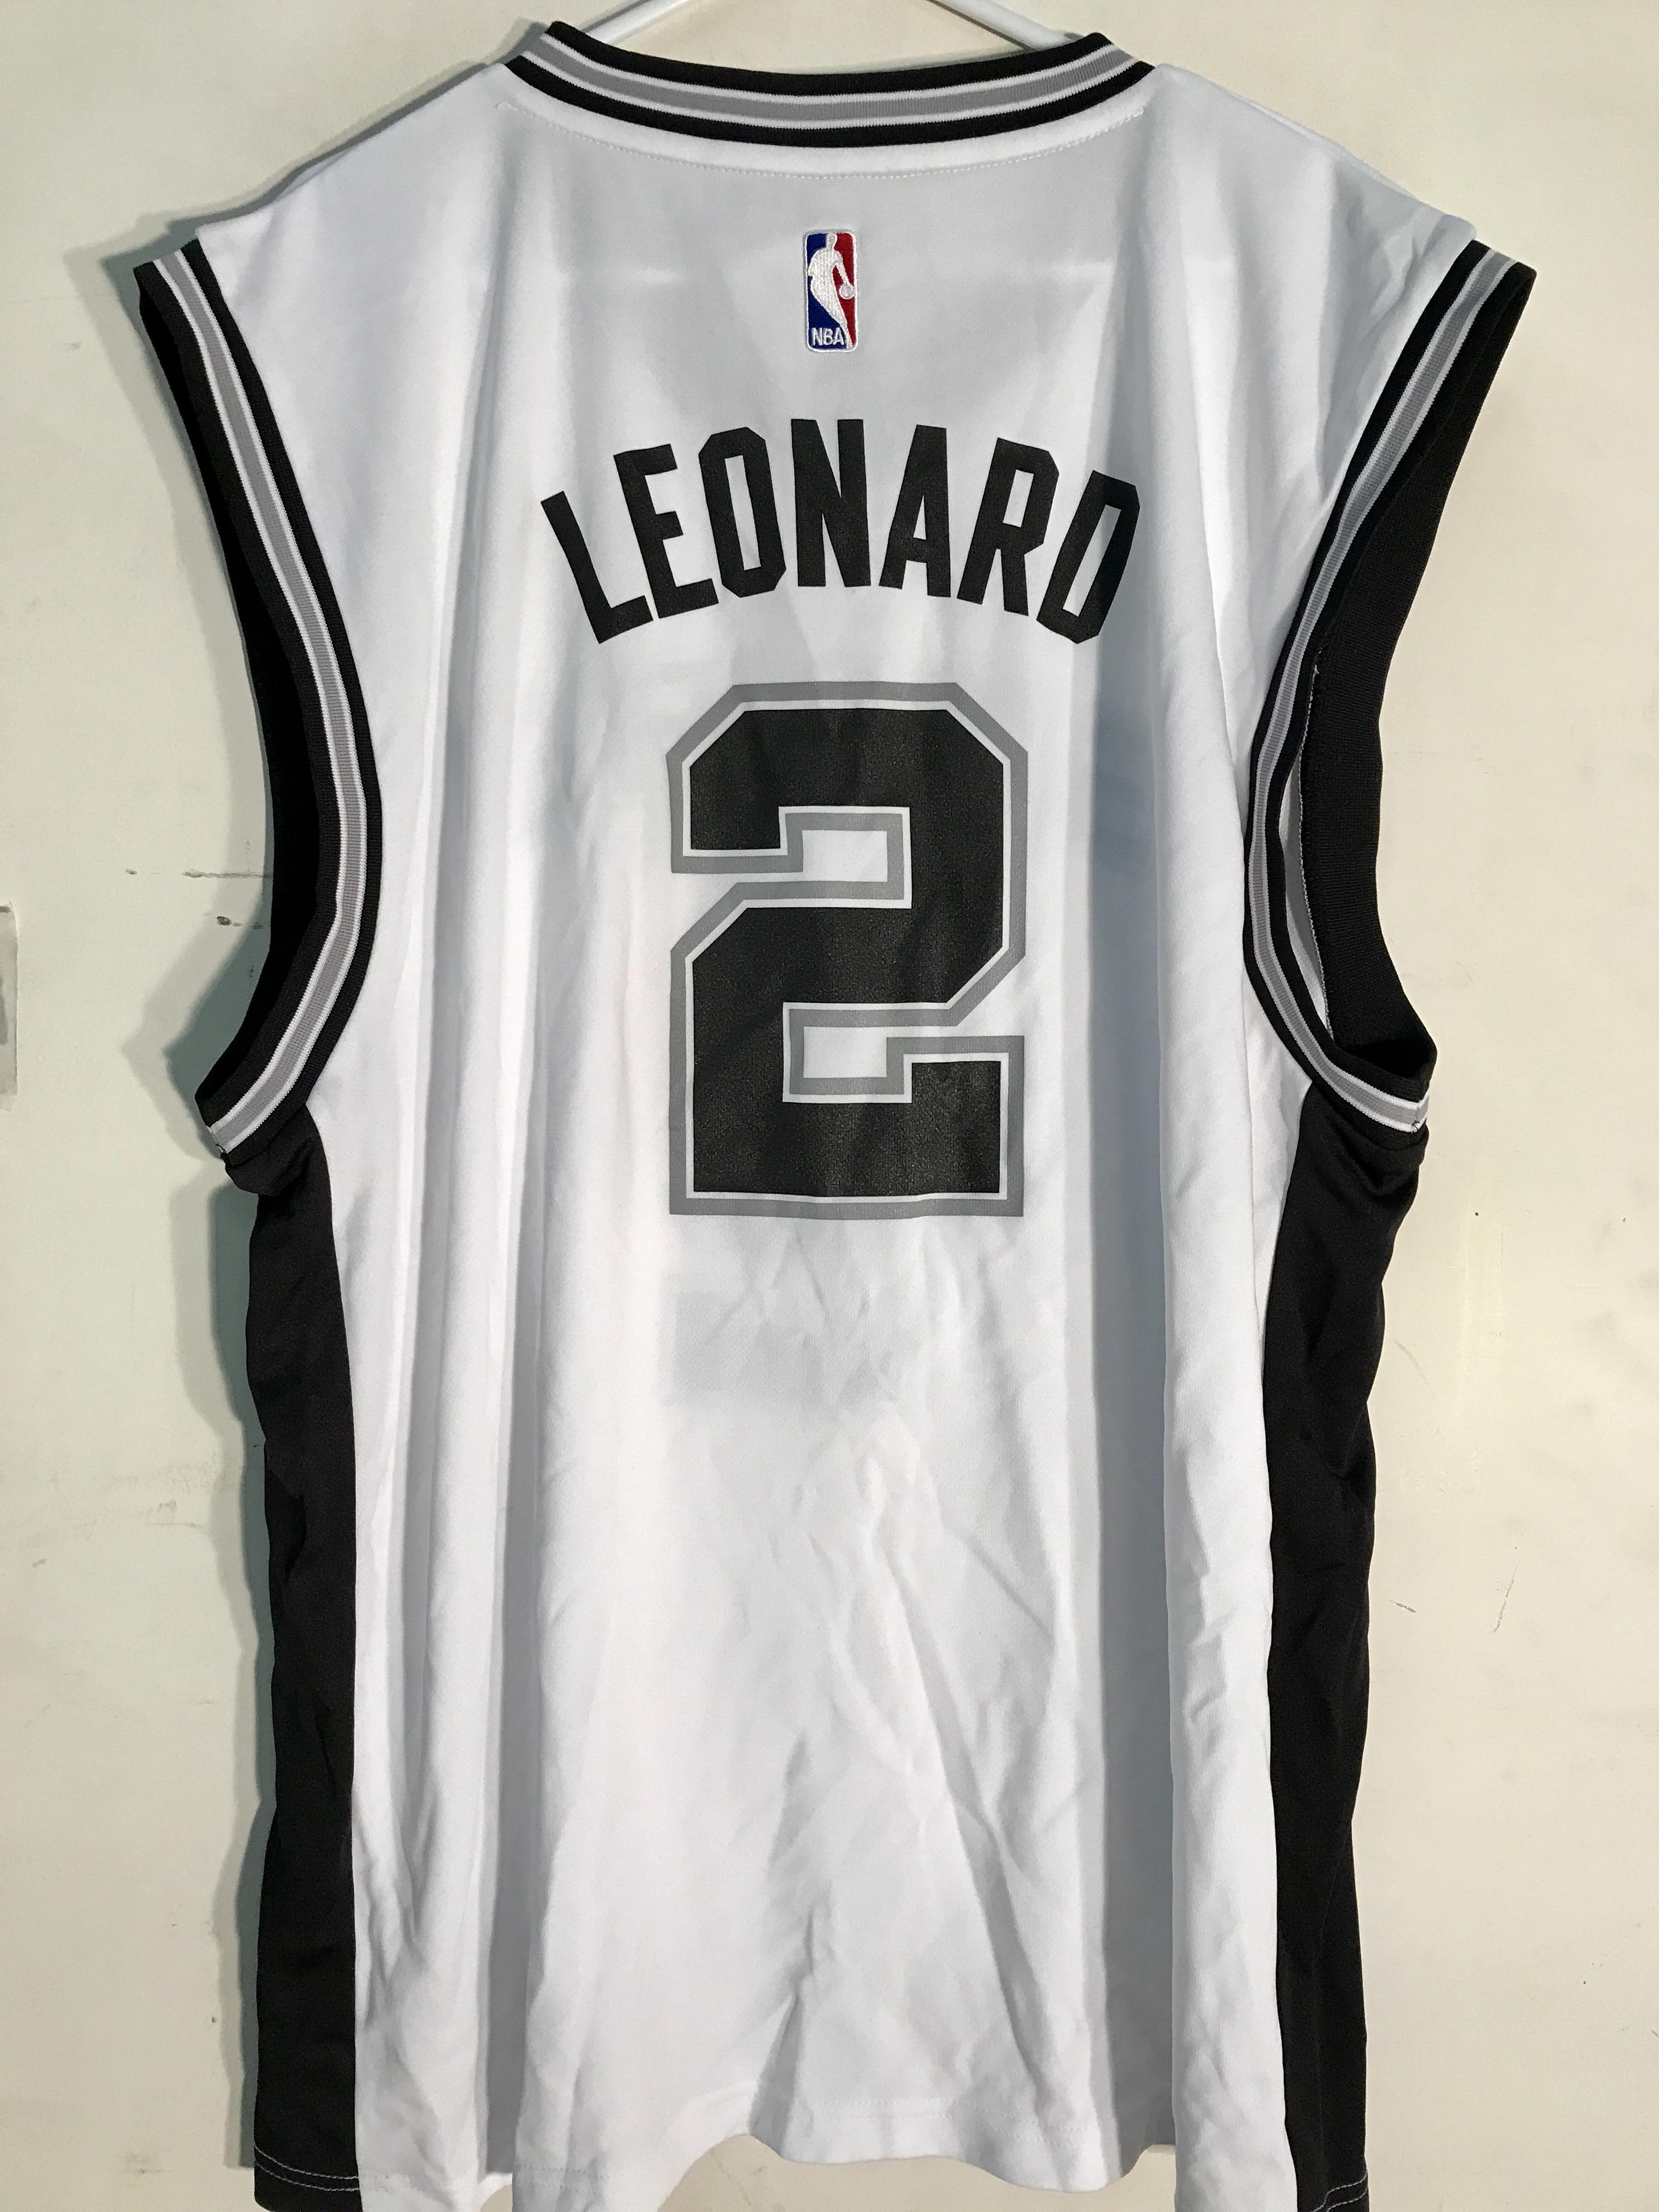 Details about Adidas NBA Jersey San Antonio Spurs Kawhi Leonard White sz 2X 3860b0976